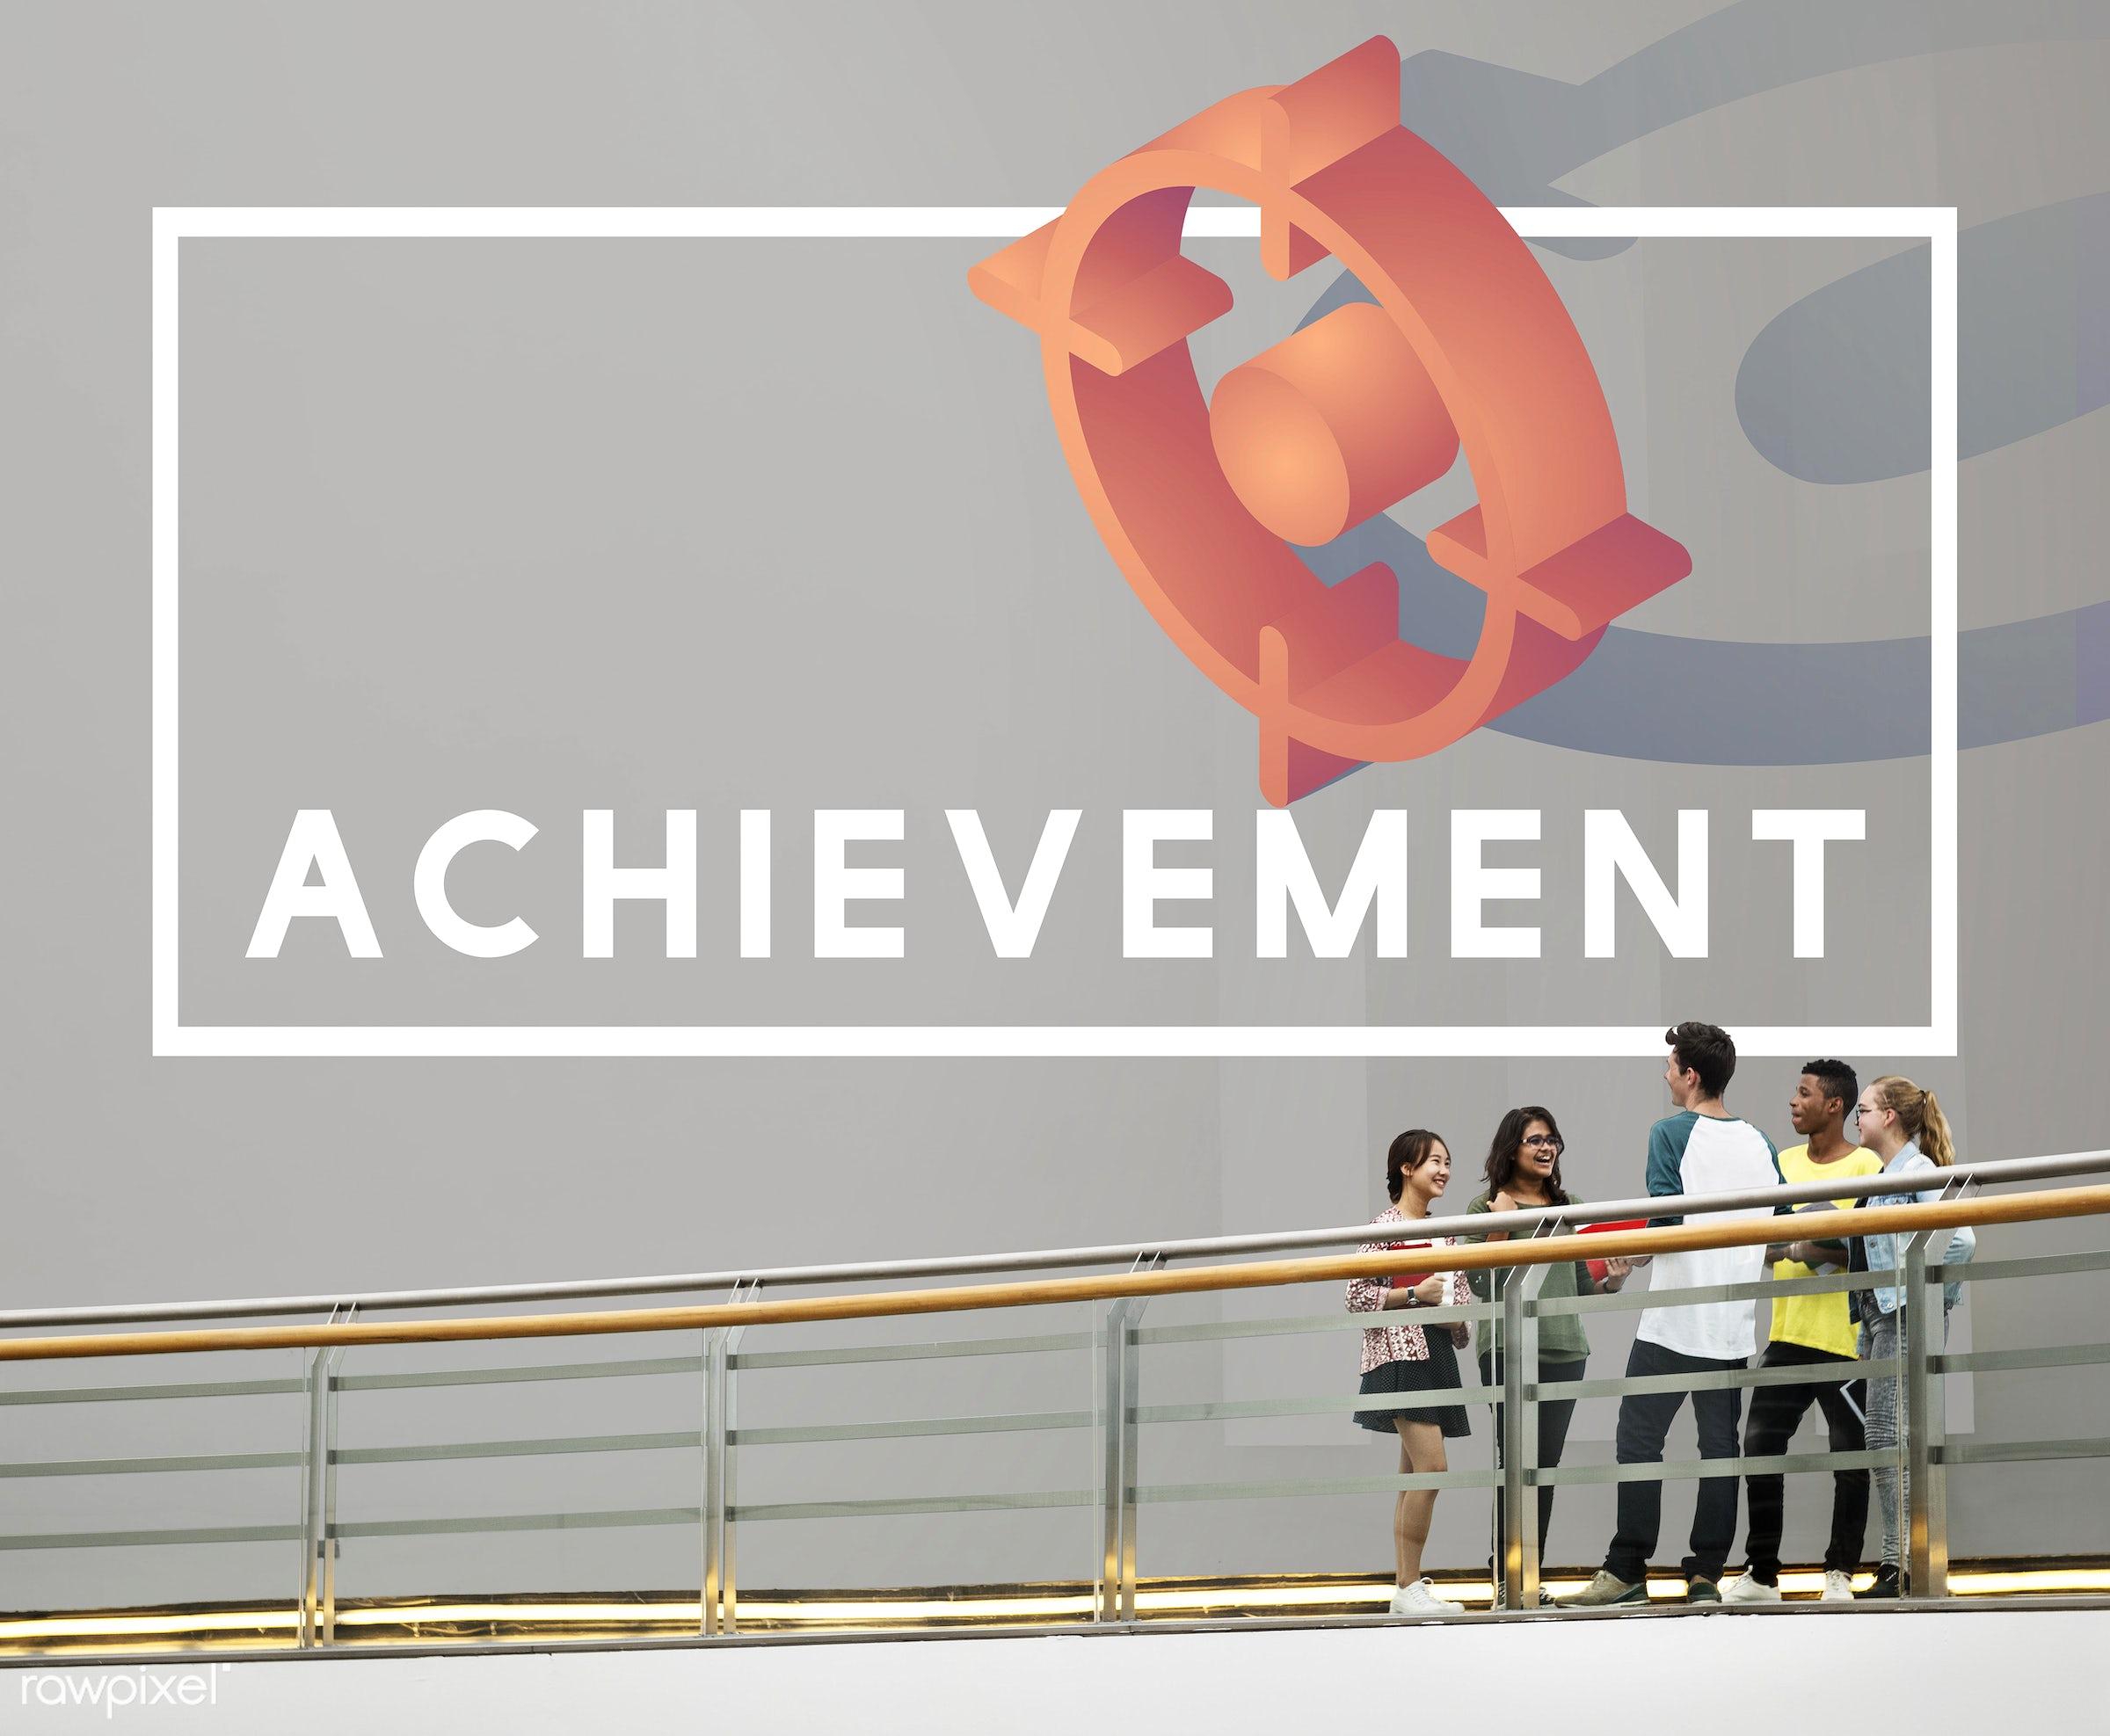 achievement, analytics, approach, book, books, boy, bridge, business, carrying, competence, development, experience, friends...